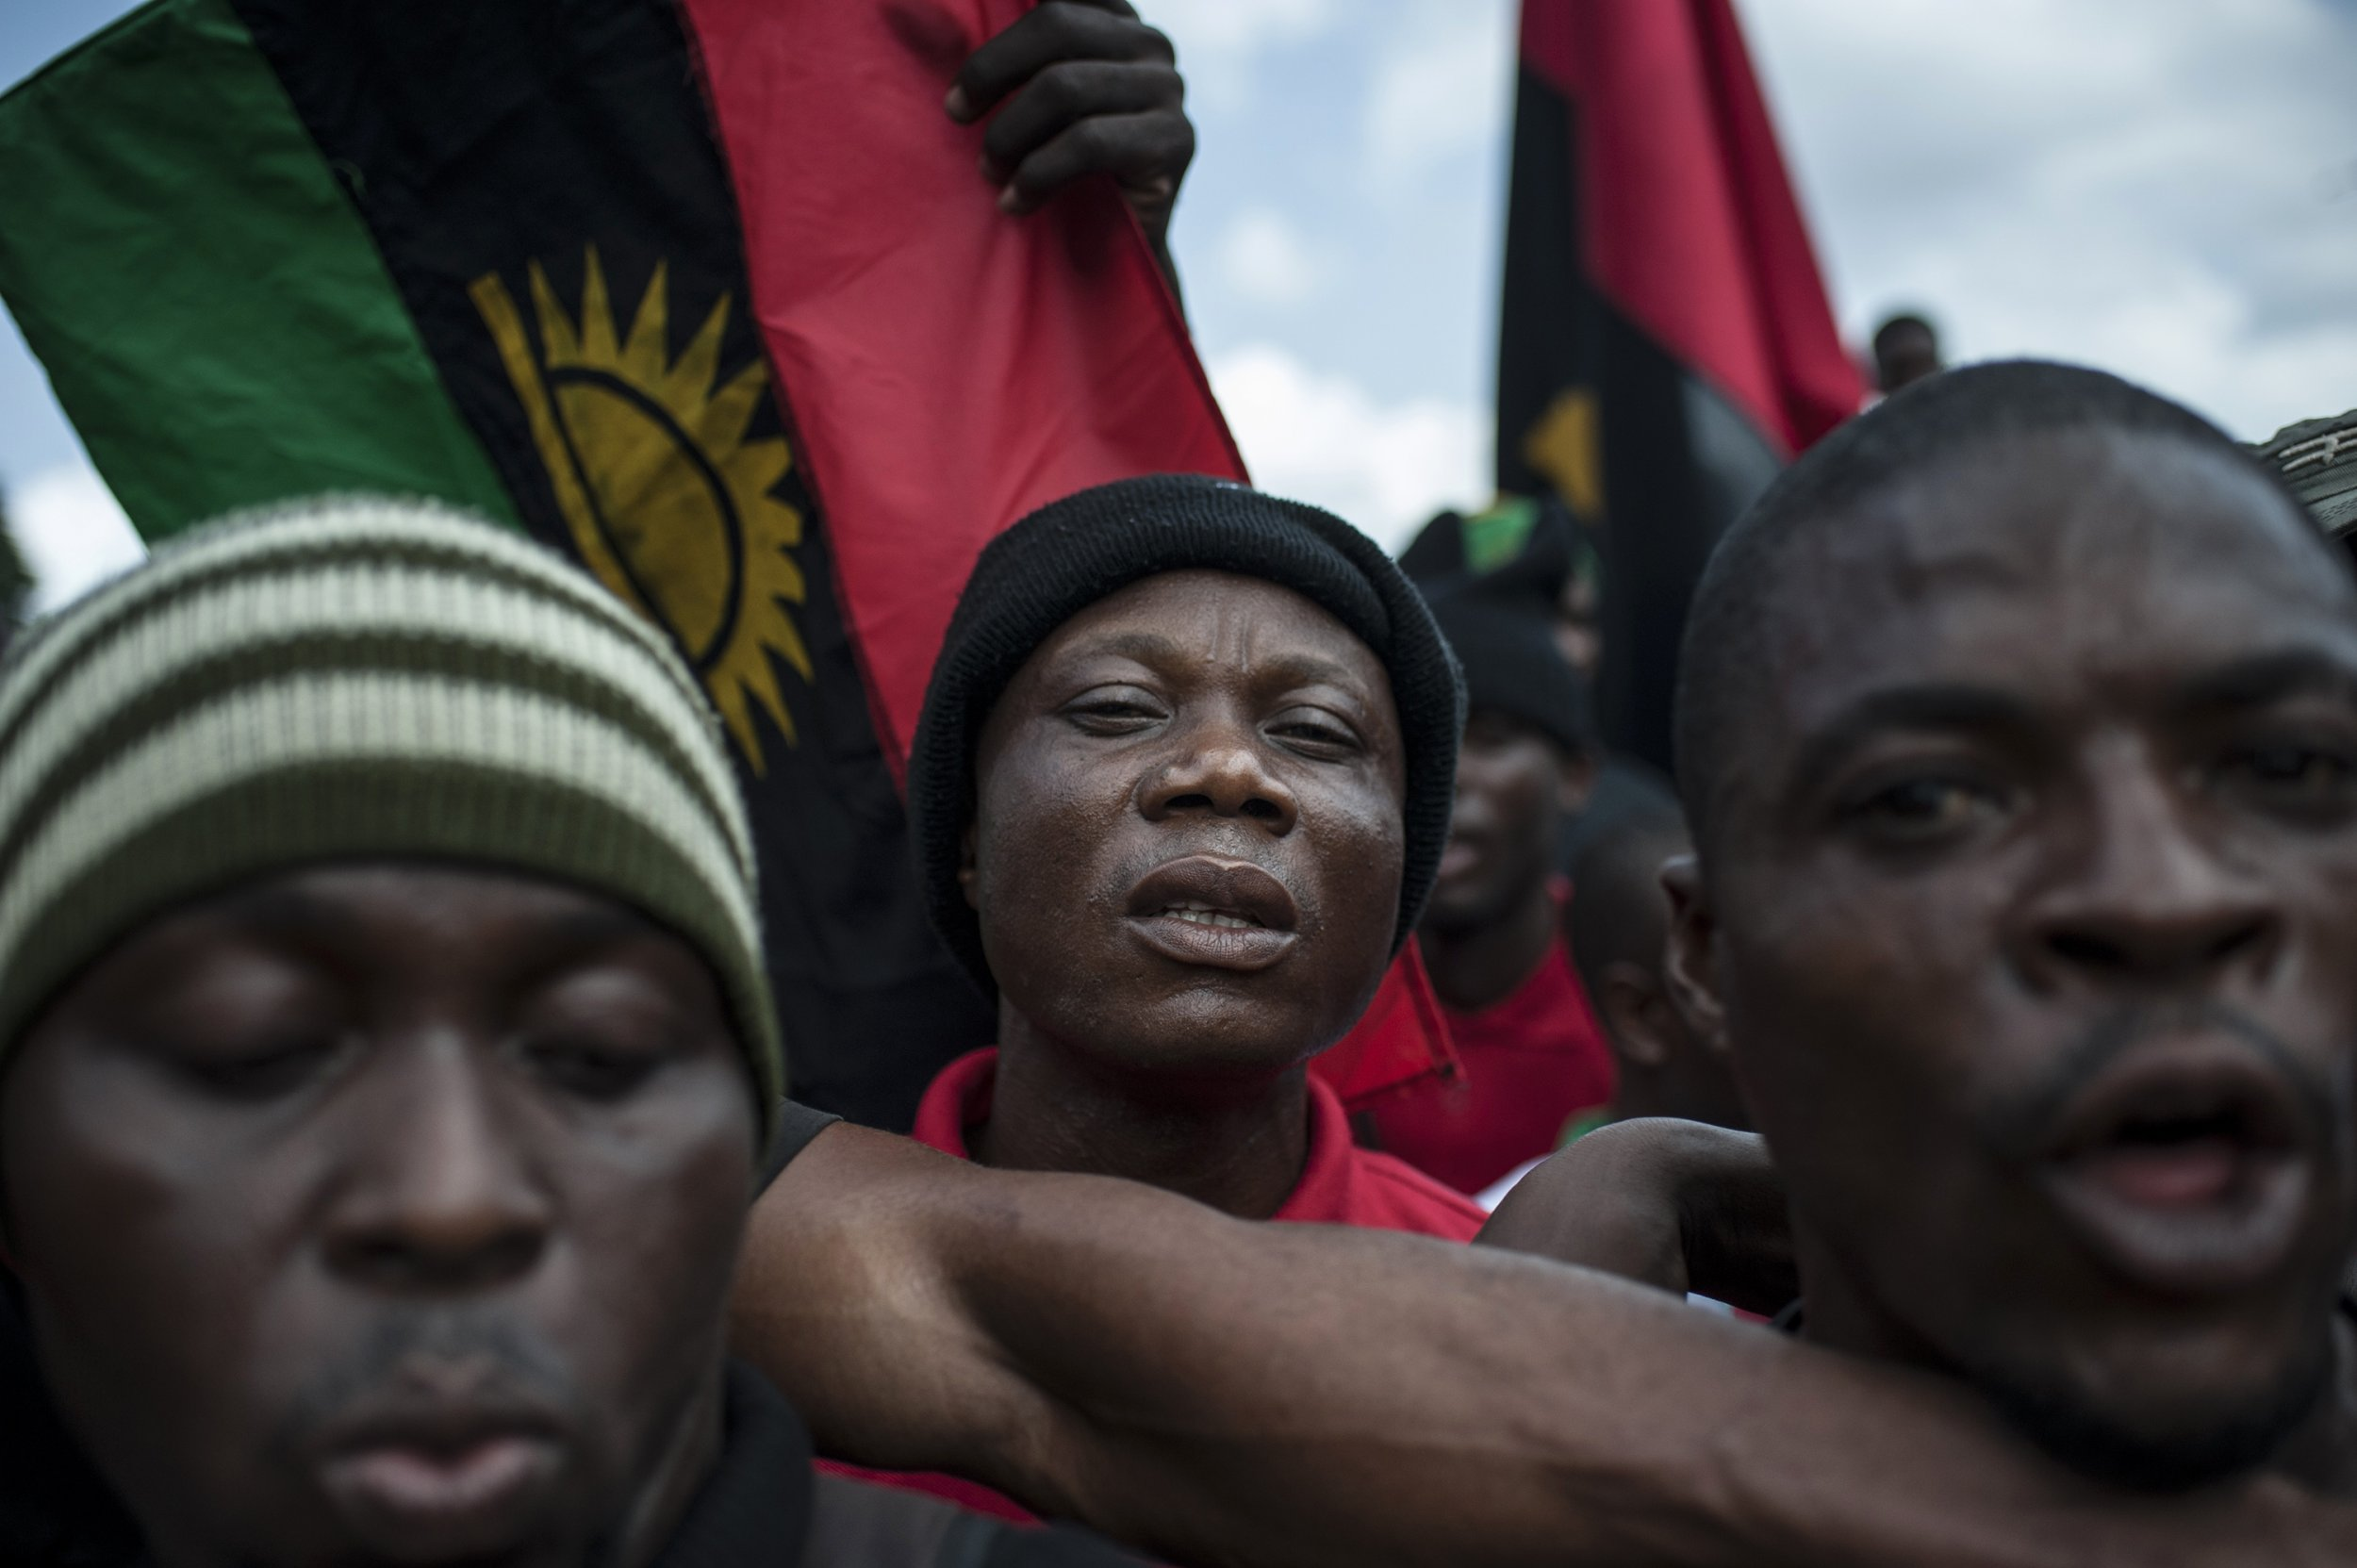 Biafra demonstration in Aba